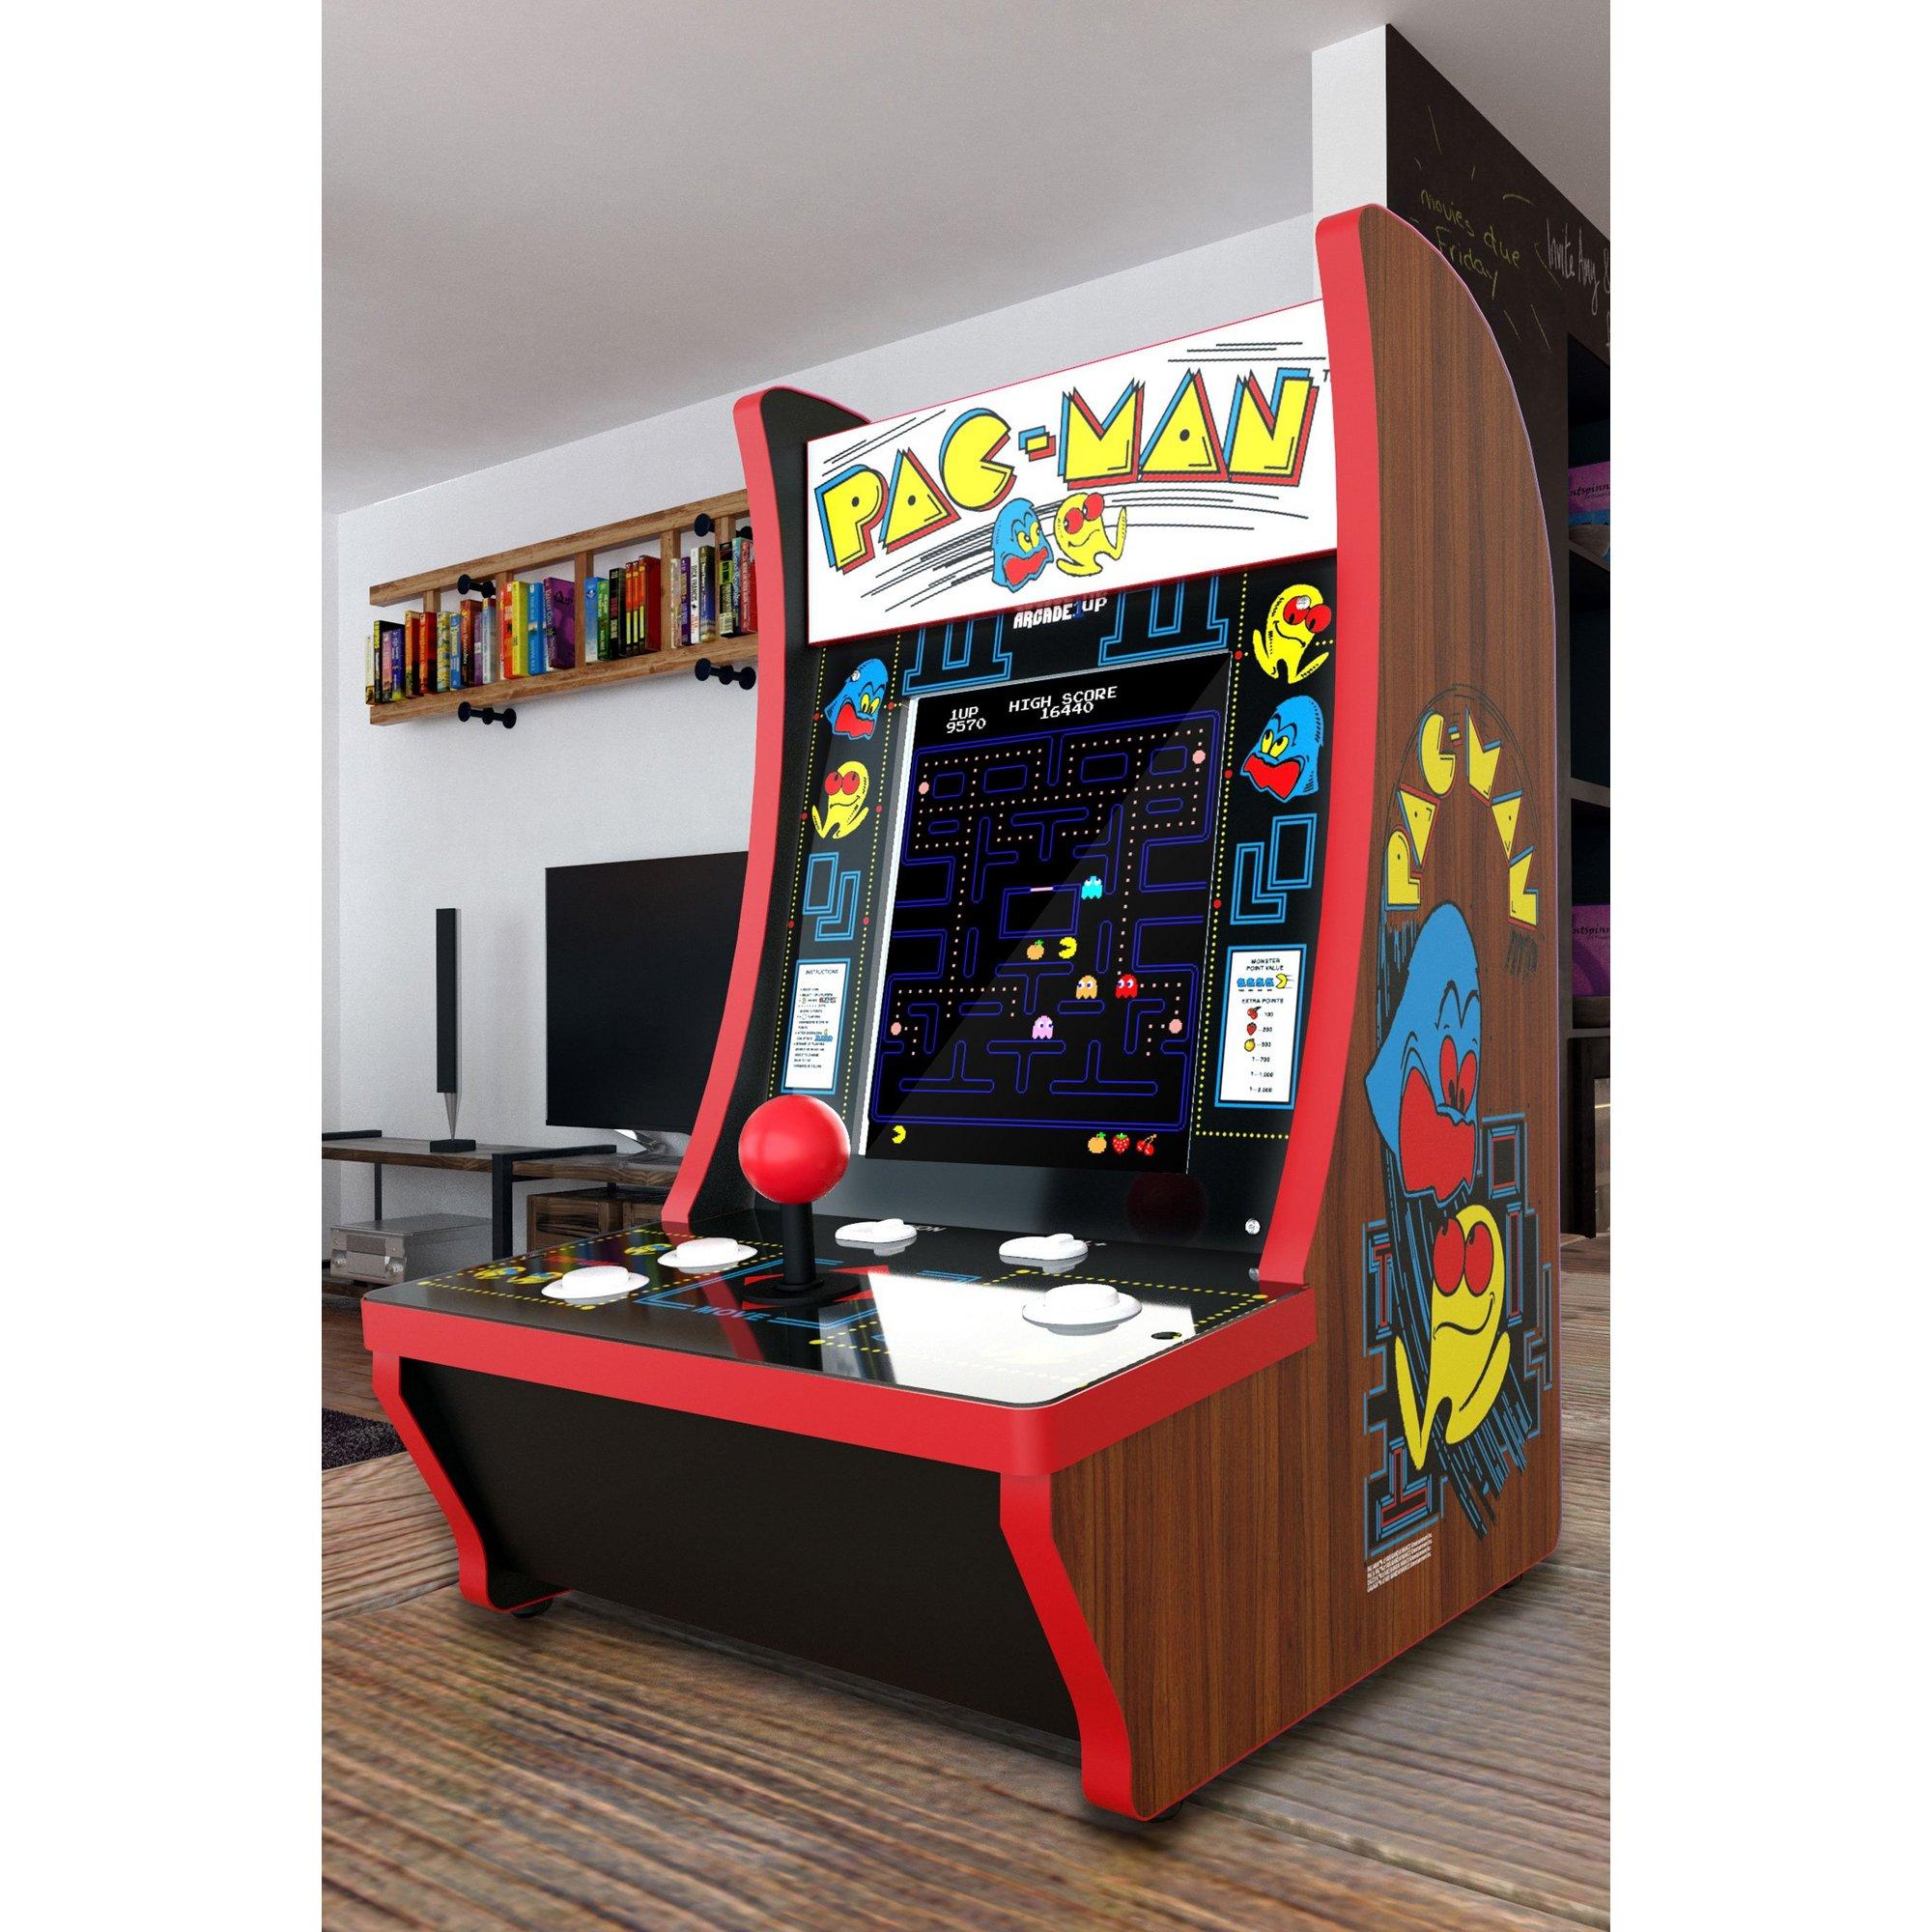 Image of 40th Year Anniversay Countercade Pac-Man